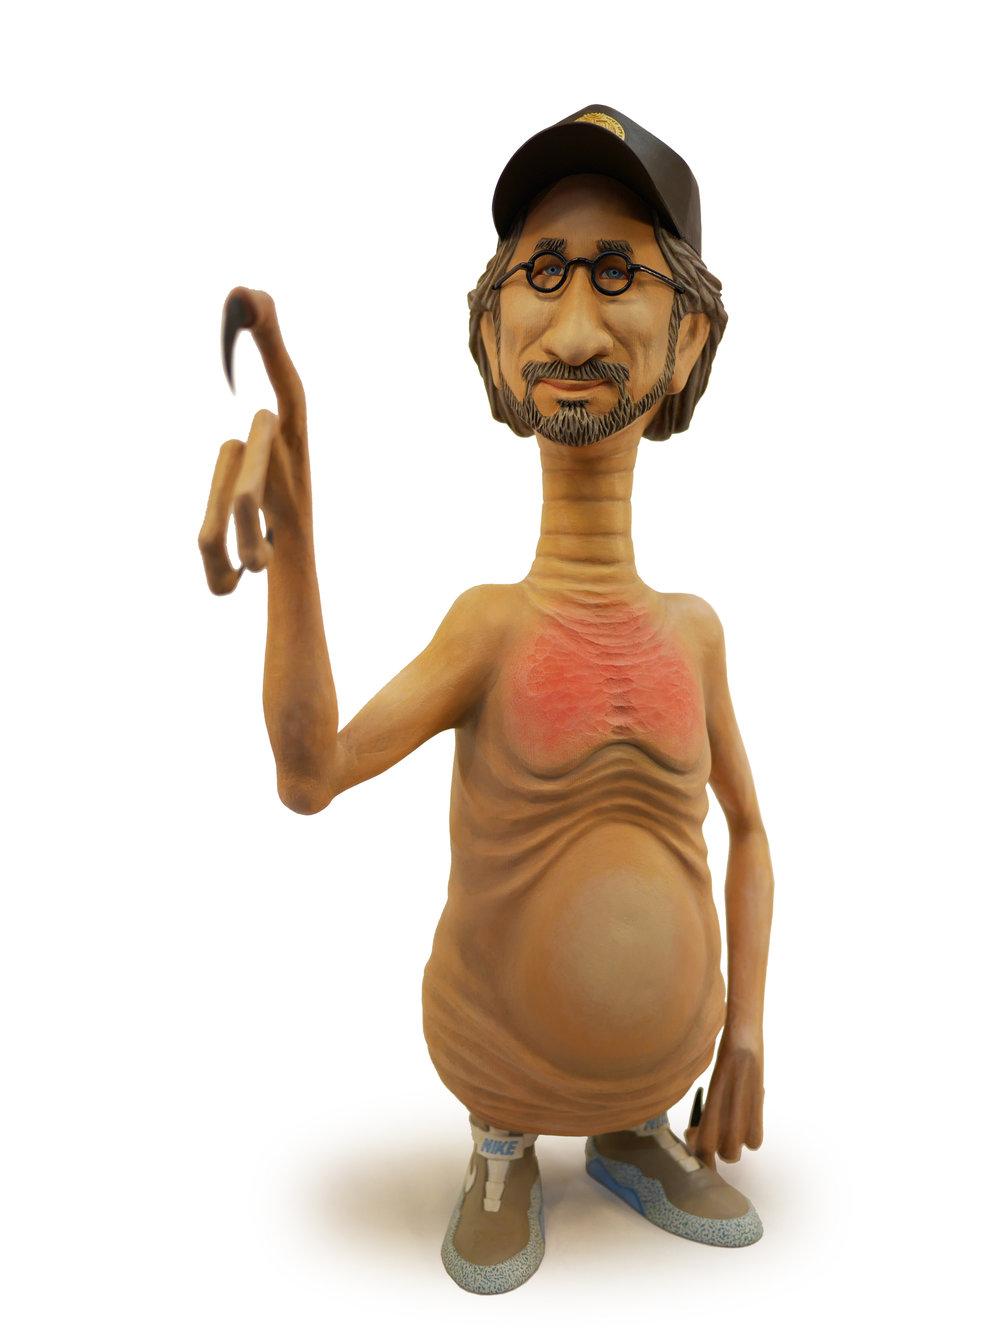 unun-king-cuts_Spielberg2.jpg